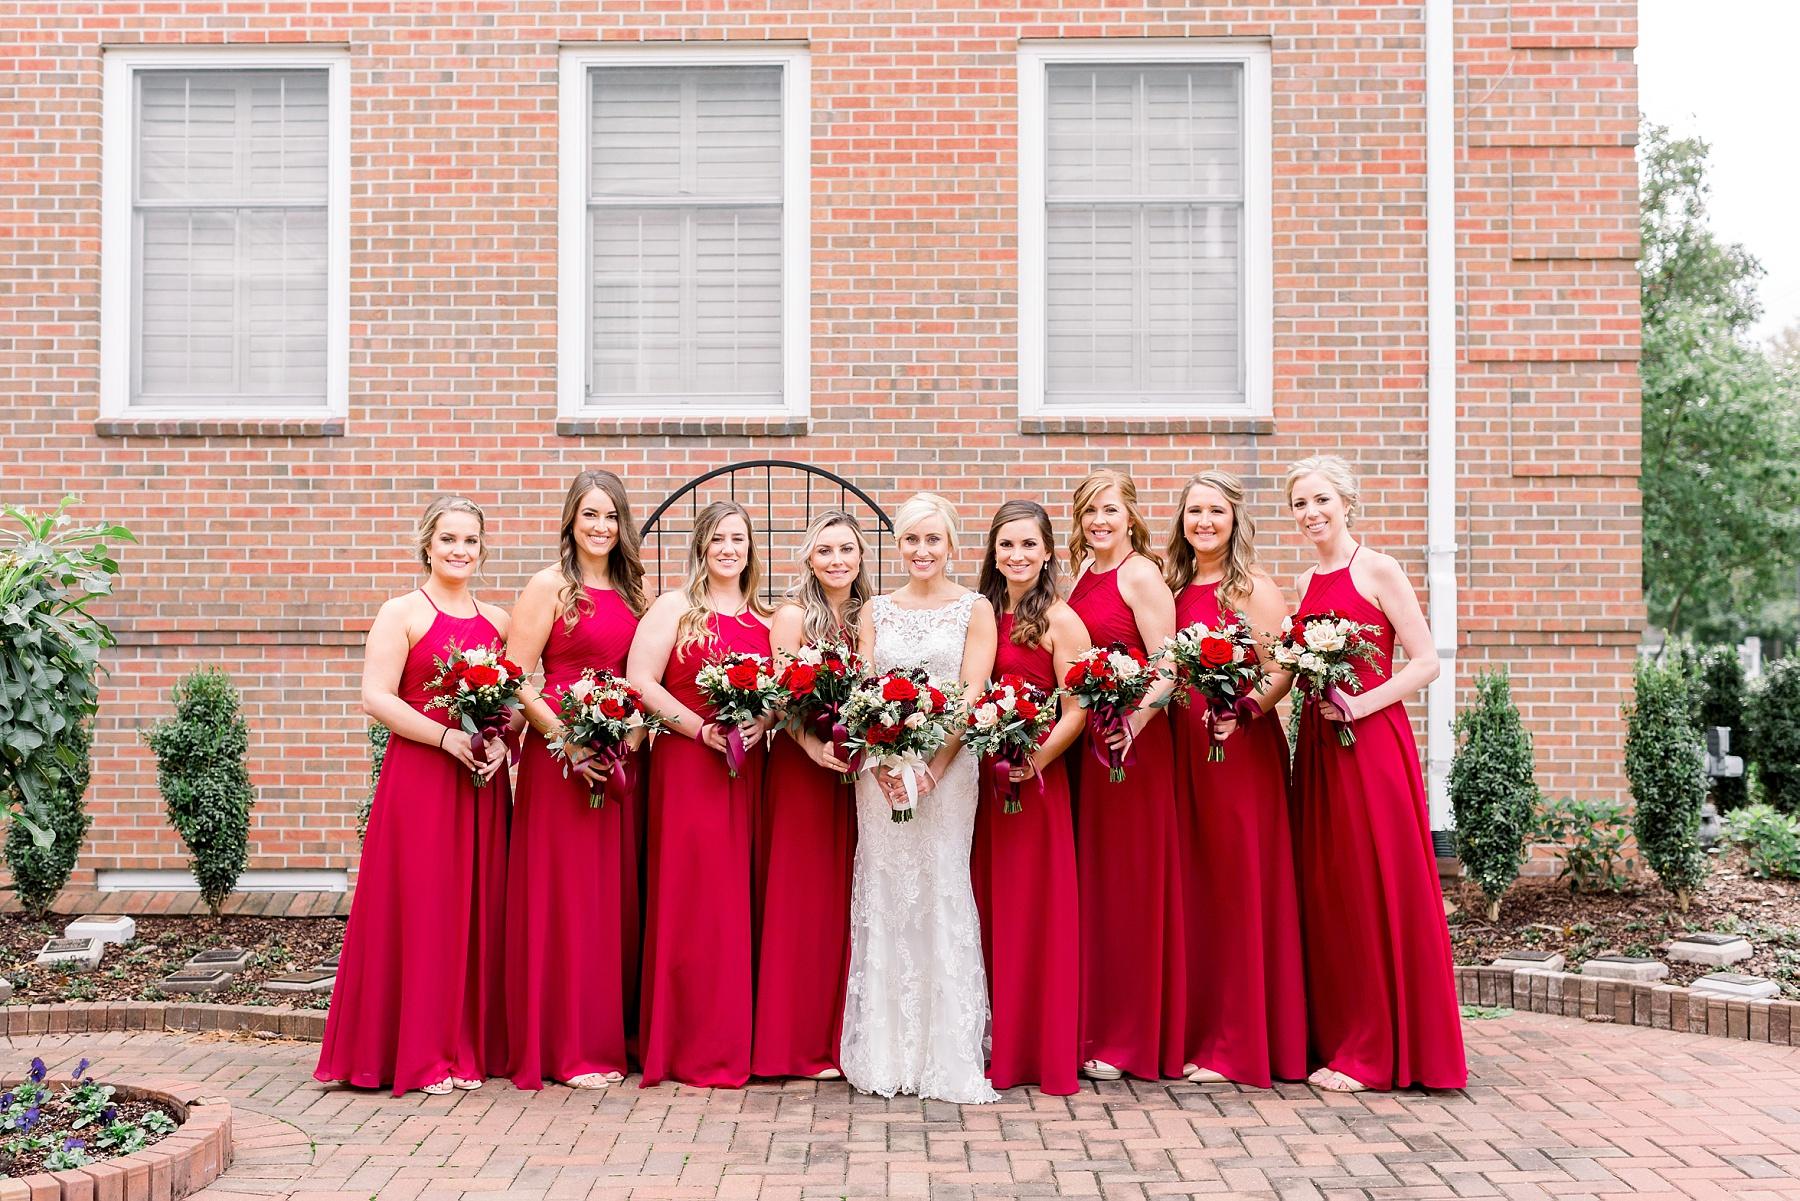 midwest-adventurous-wedding-photographer-elizabeth-ladean-photography-photo_4818.jpg